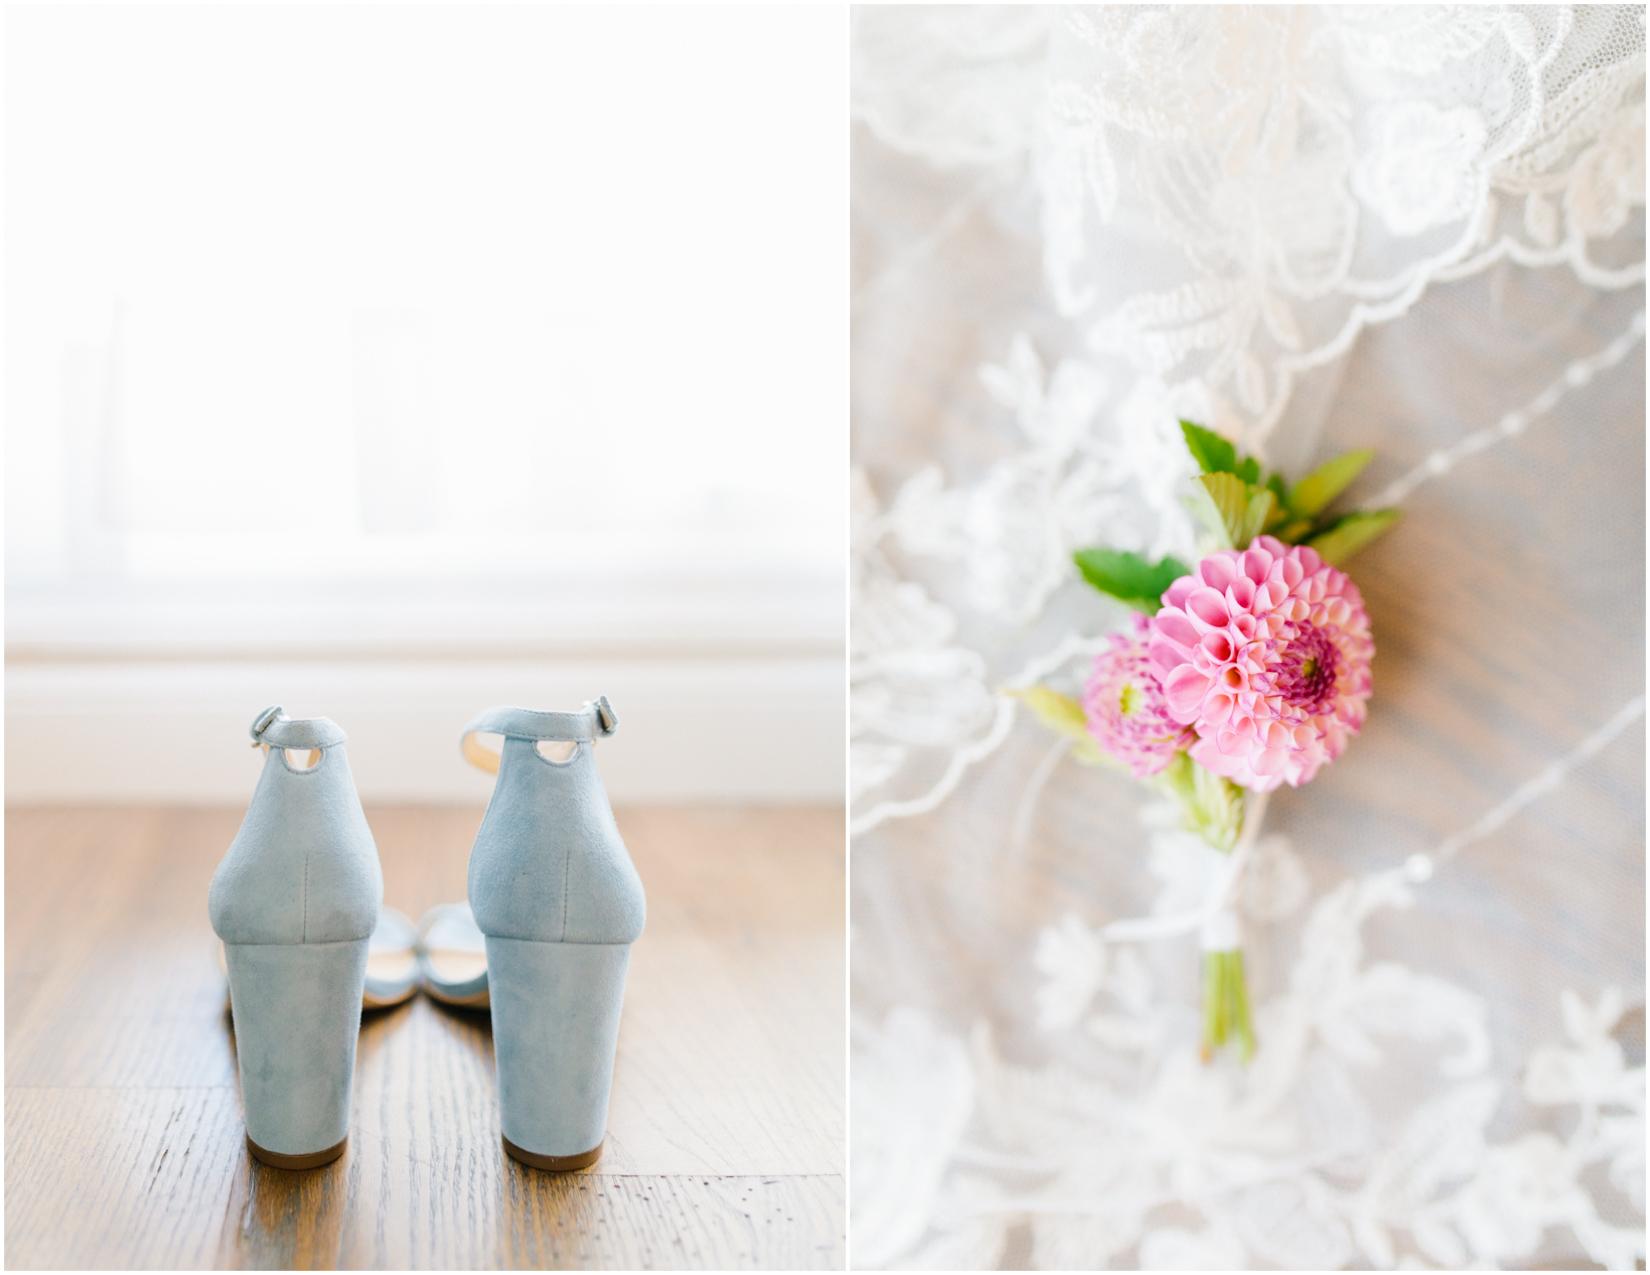 Tennessee River Place Wedding | Chattanooga, TN Wedding | Beautiful Wedding Details | Blue Heels Wedding Day | Southern Bride | VSCO | Emma Rose Company.jpg